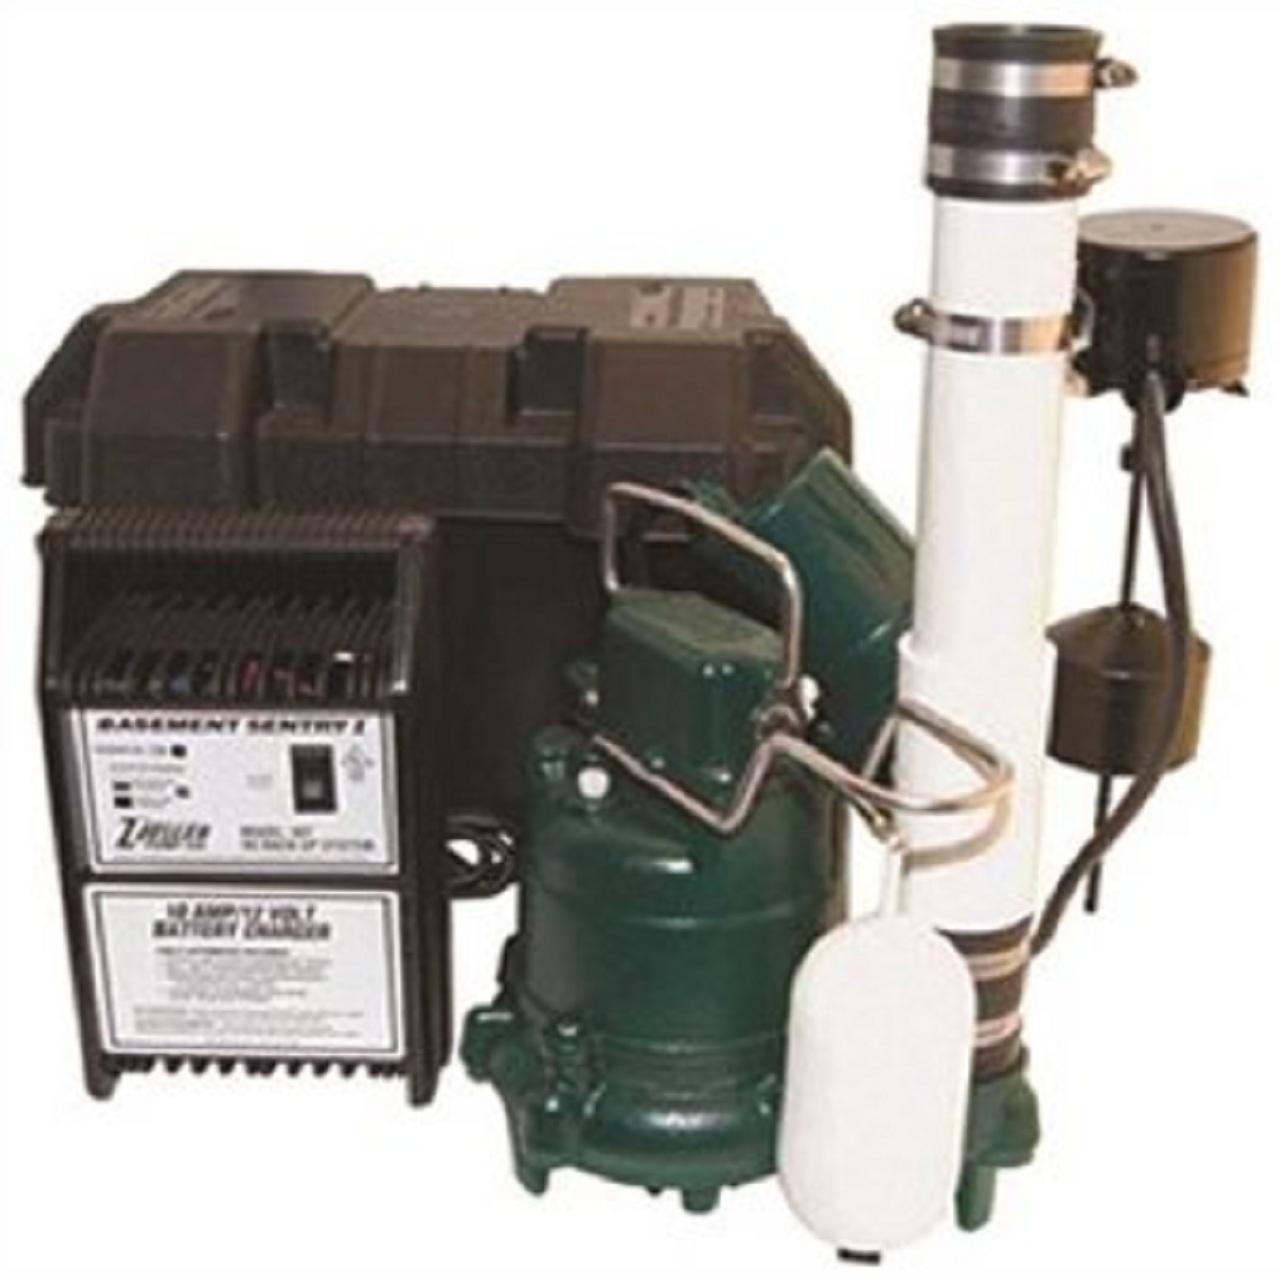 Sump Pumps Comparison Table Zoeller Submersible Pump Wiring Diagram